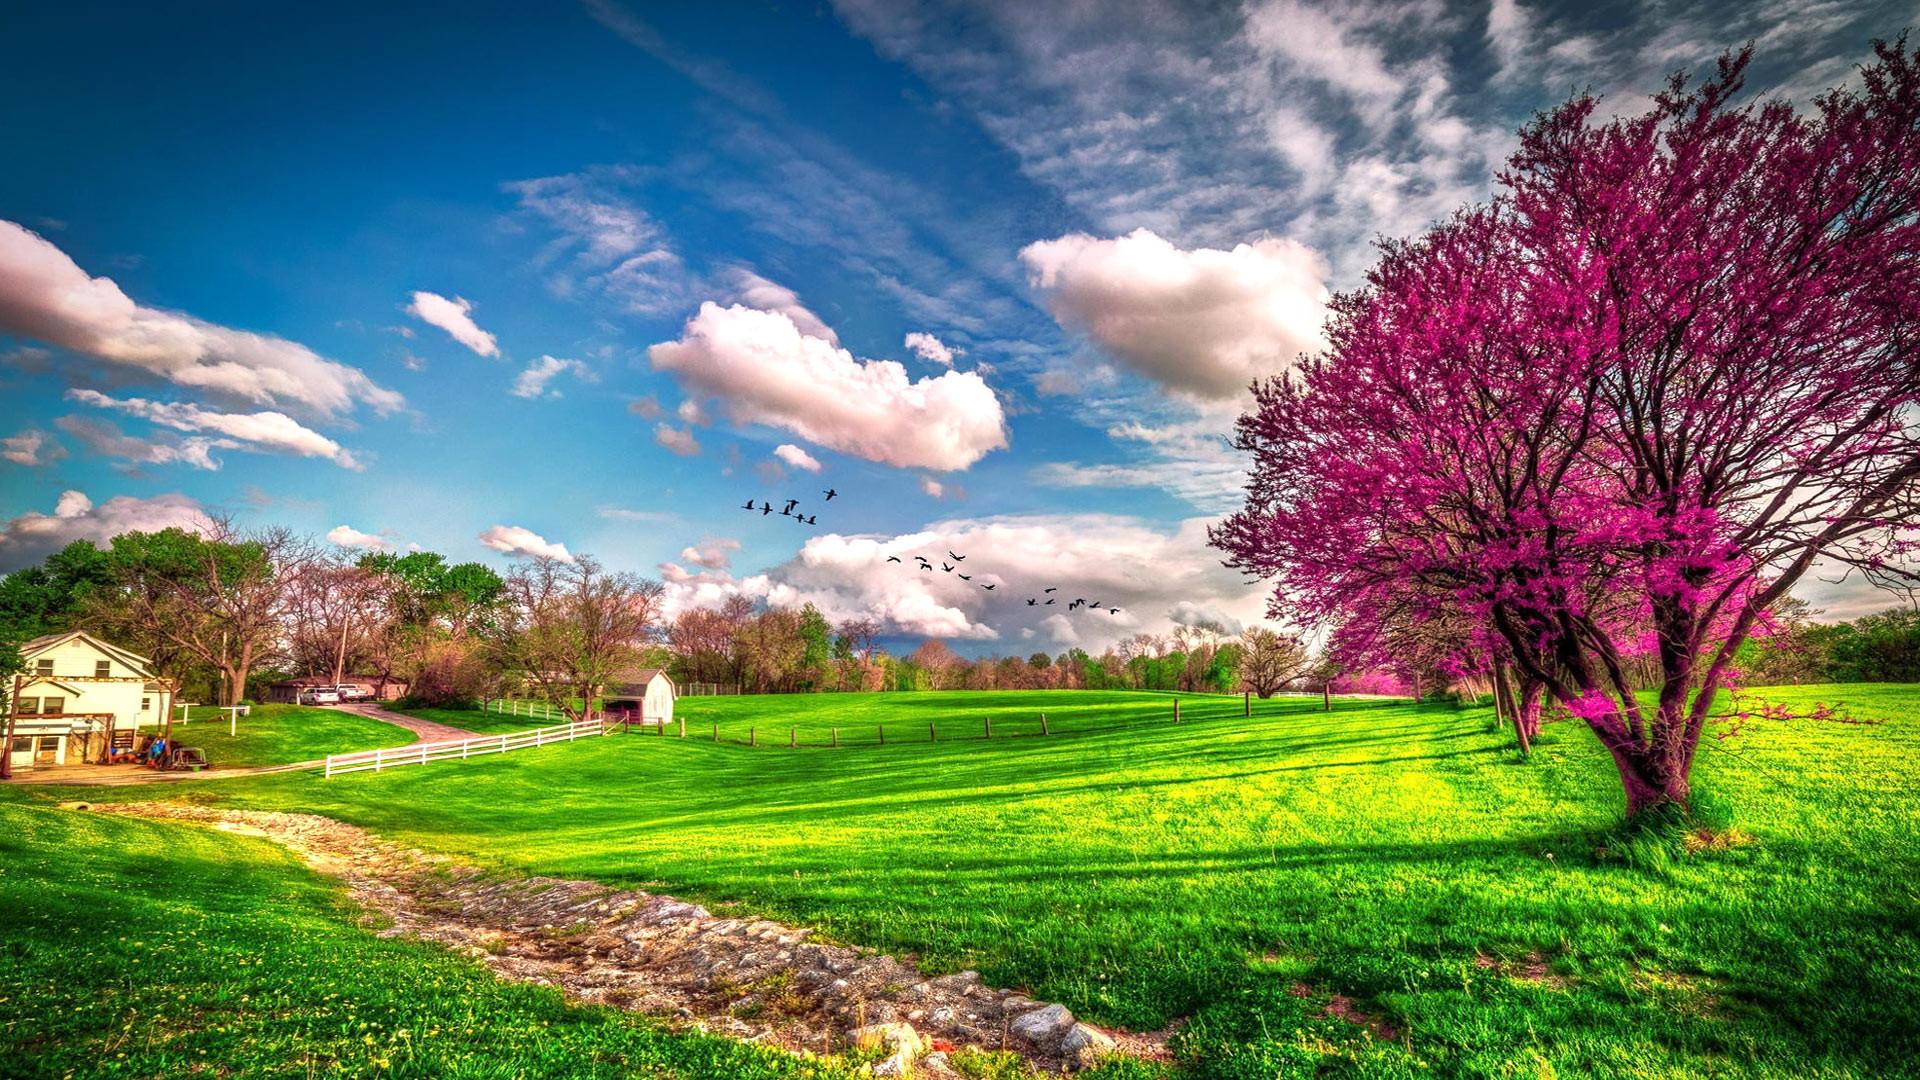 Spring nature photos free download